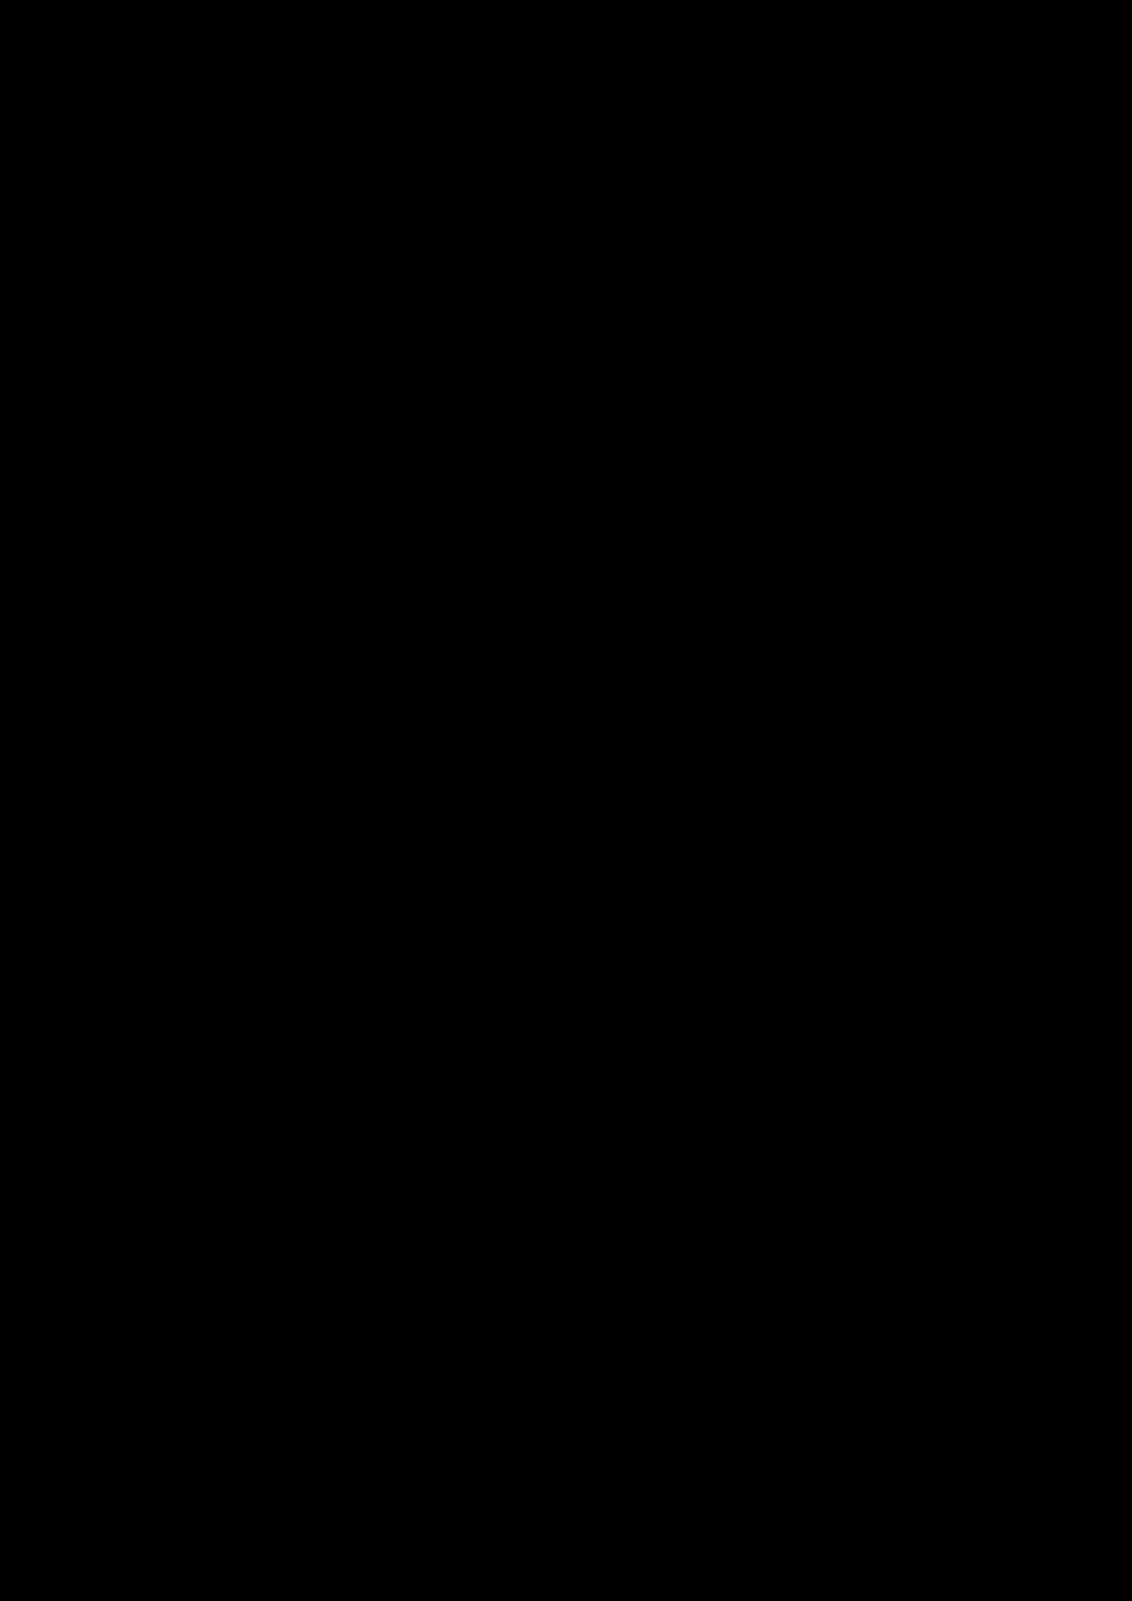 Ispoved Pervogo Boga slide, Image 28